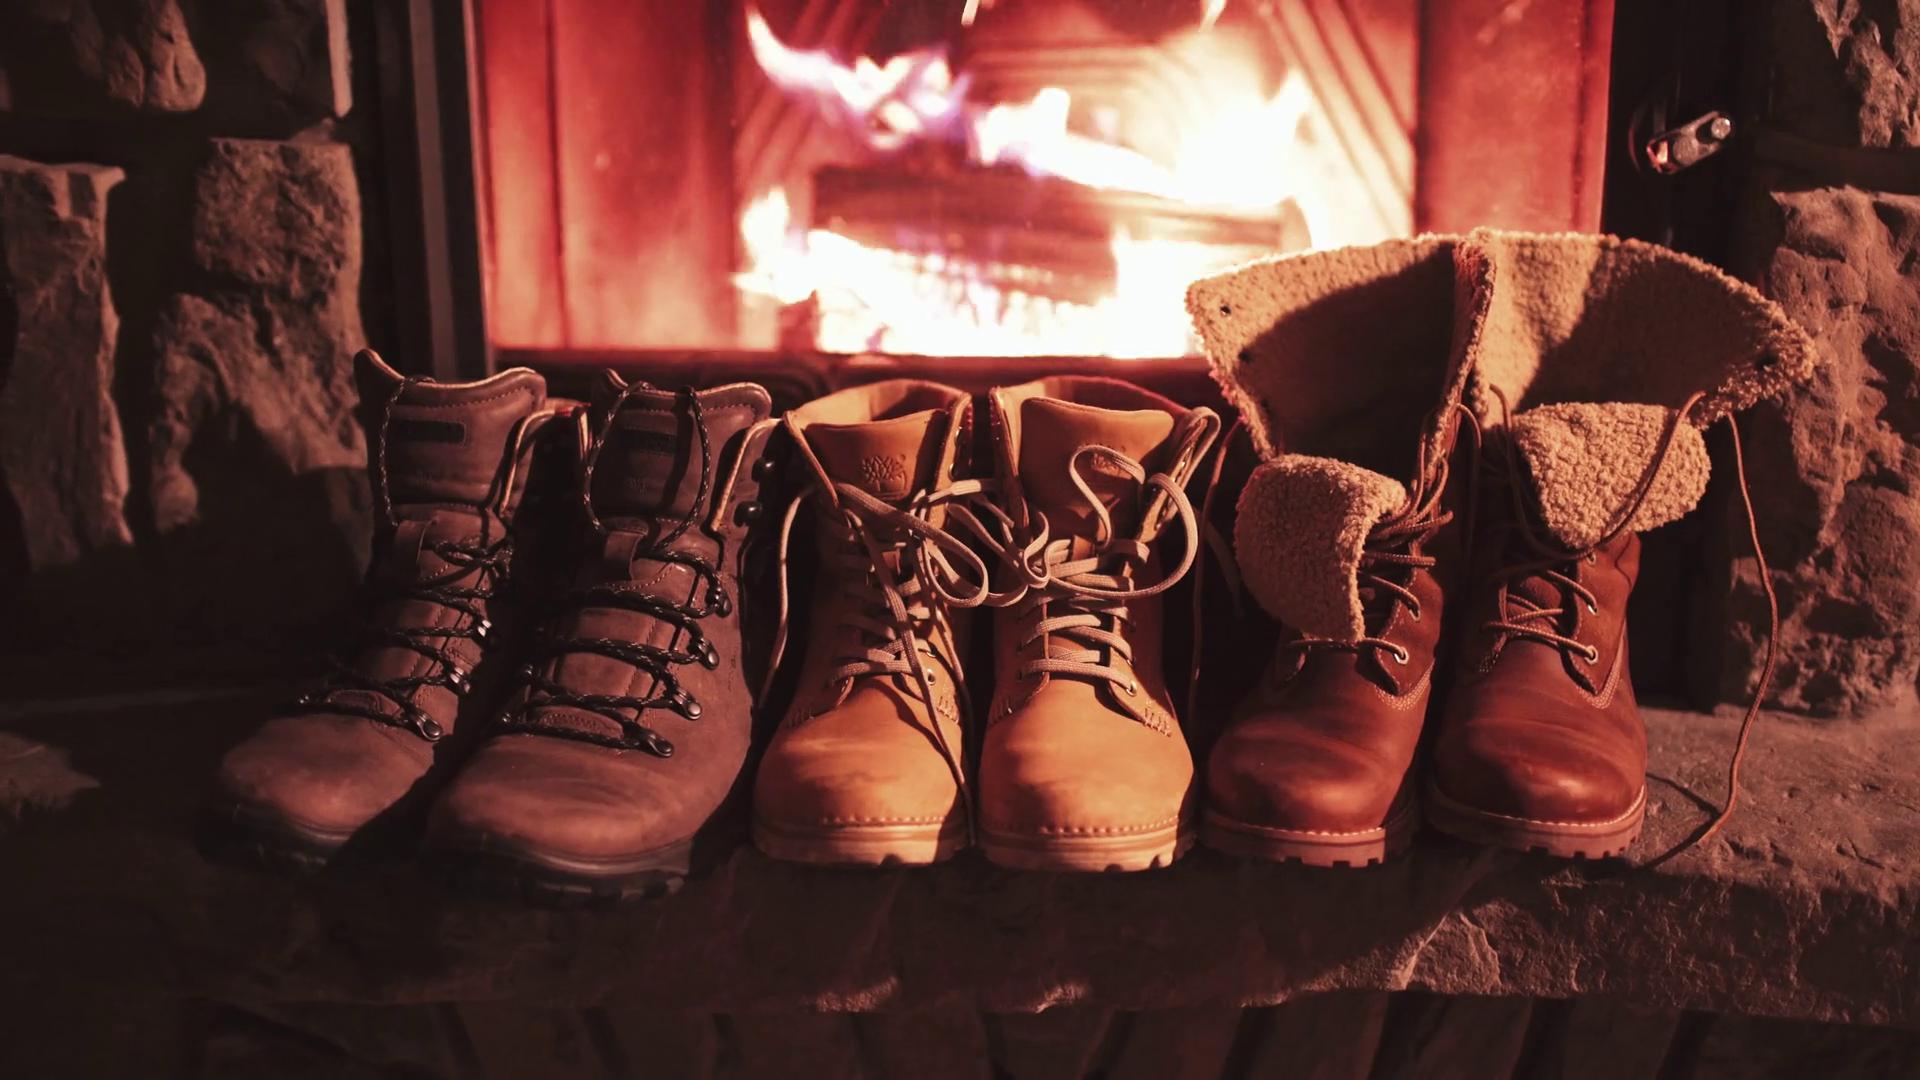 Woman Hand takes Warm Winter Boots from a Shelf near Fireplace. 4K ...